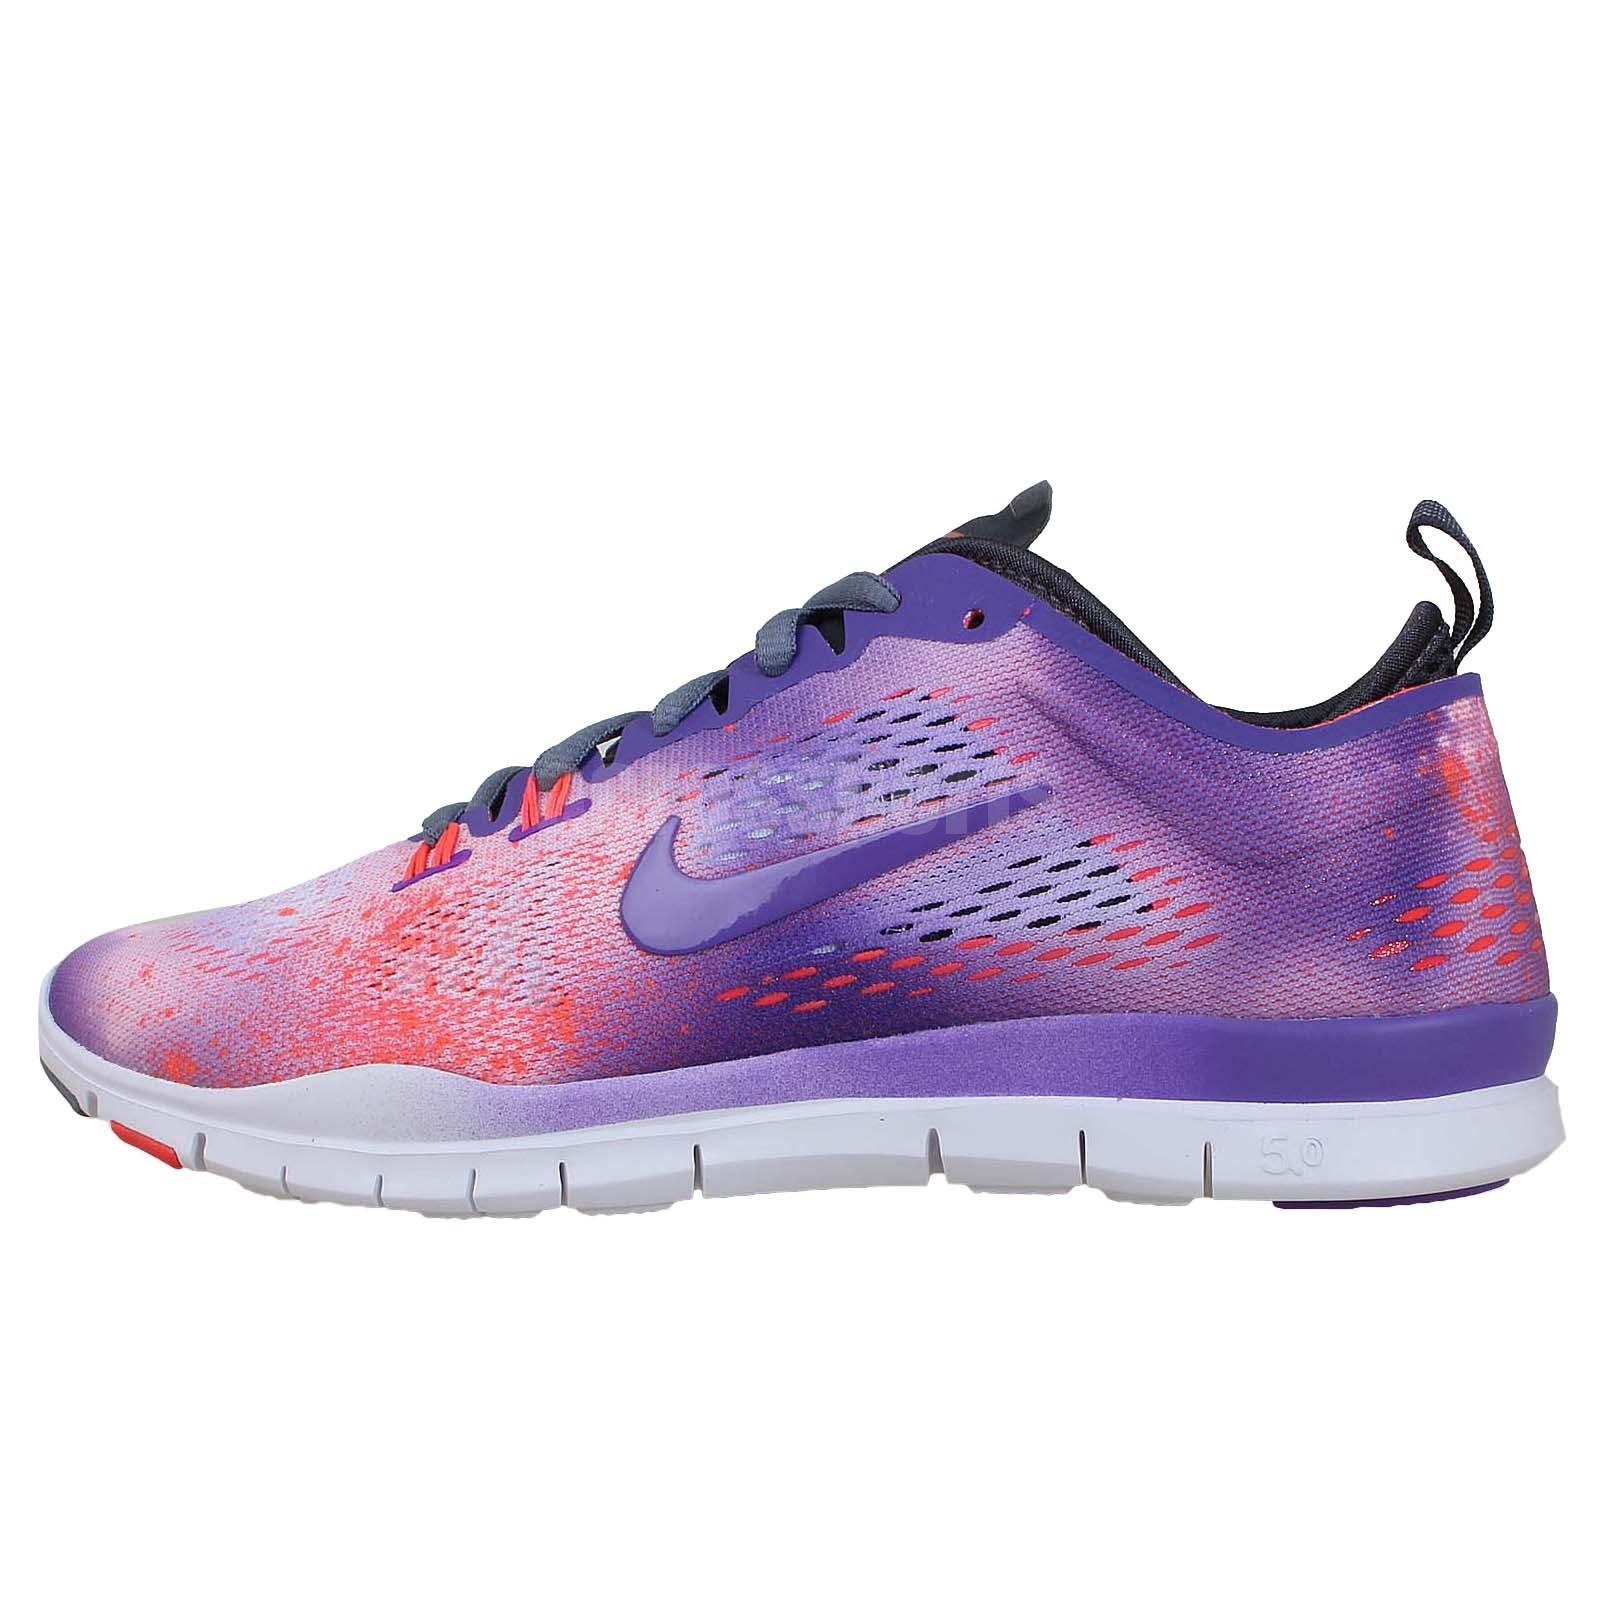 Nike Wmns Free 5.0 TR Fit 4 PRT Print Galaxy 2014 Womens Cross Training Shoes   eBay